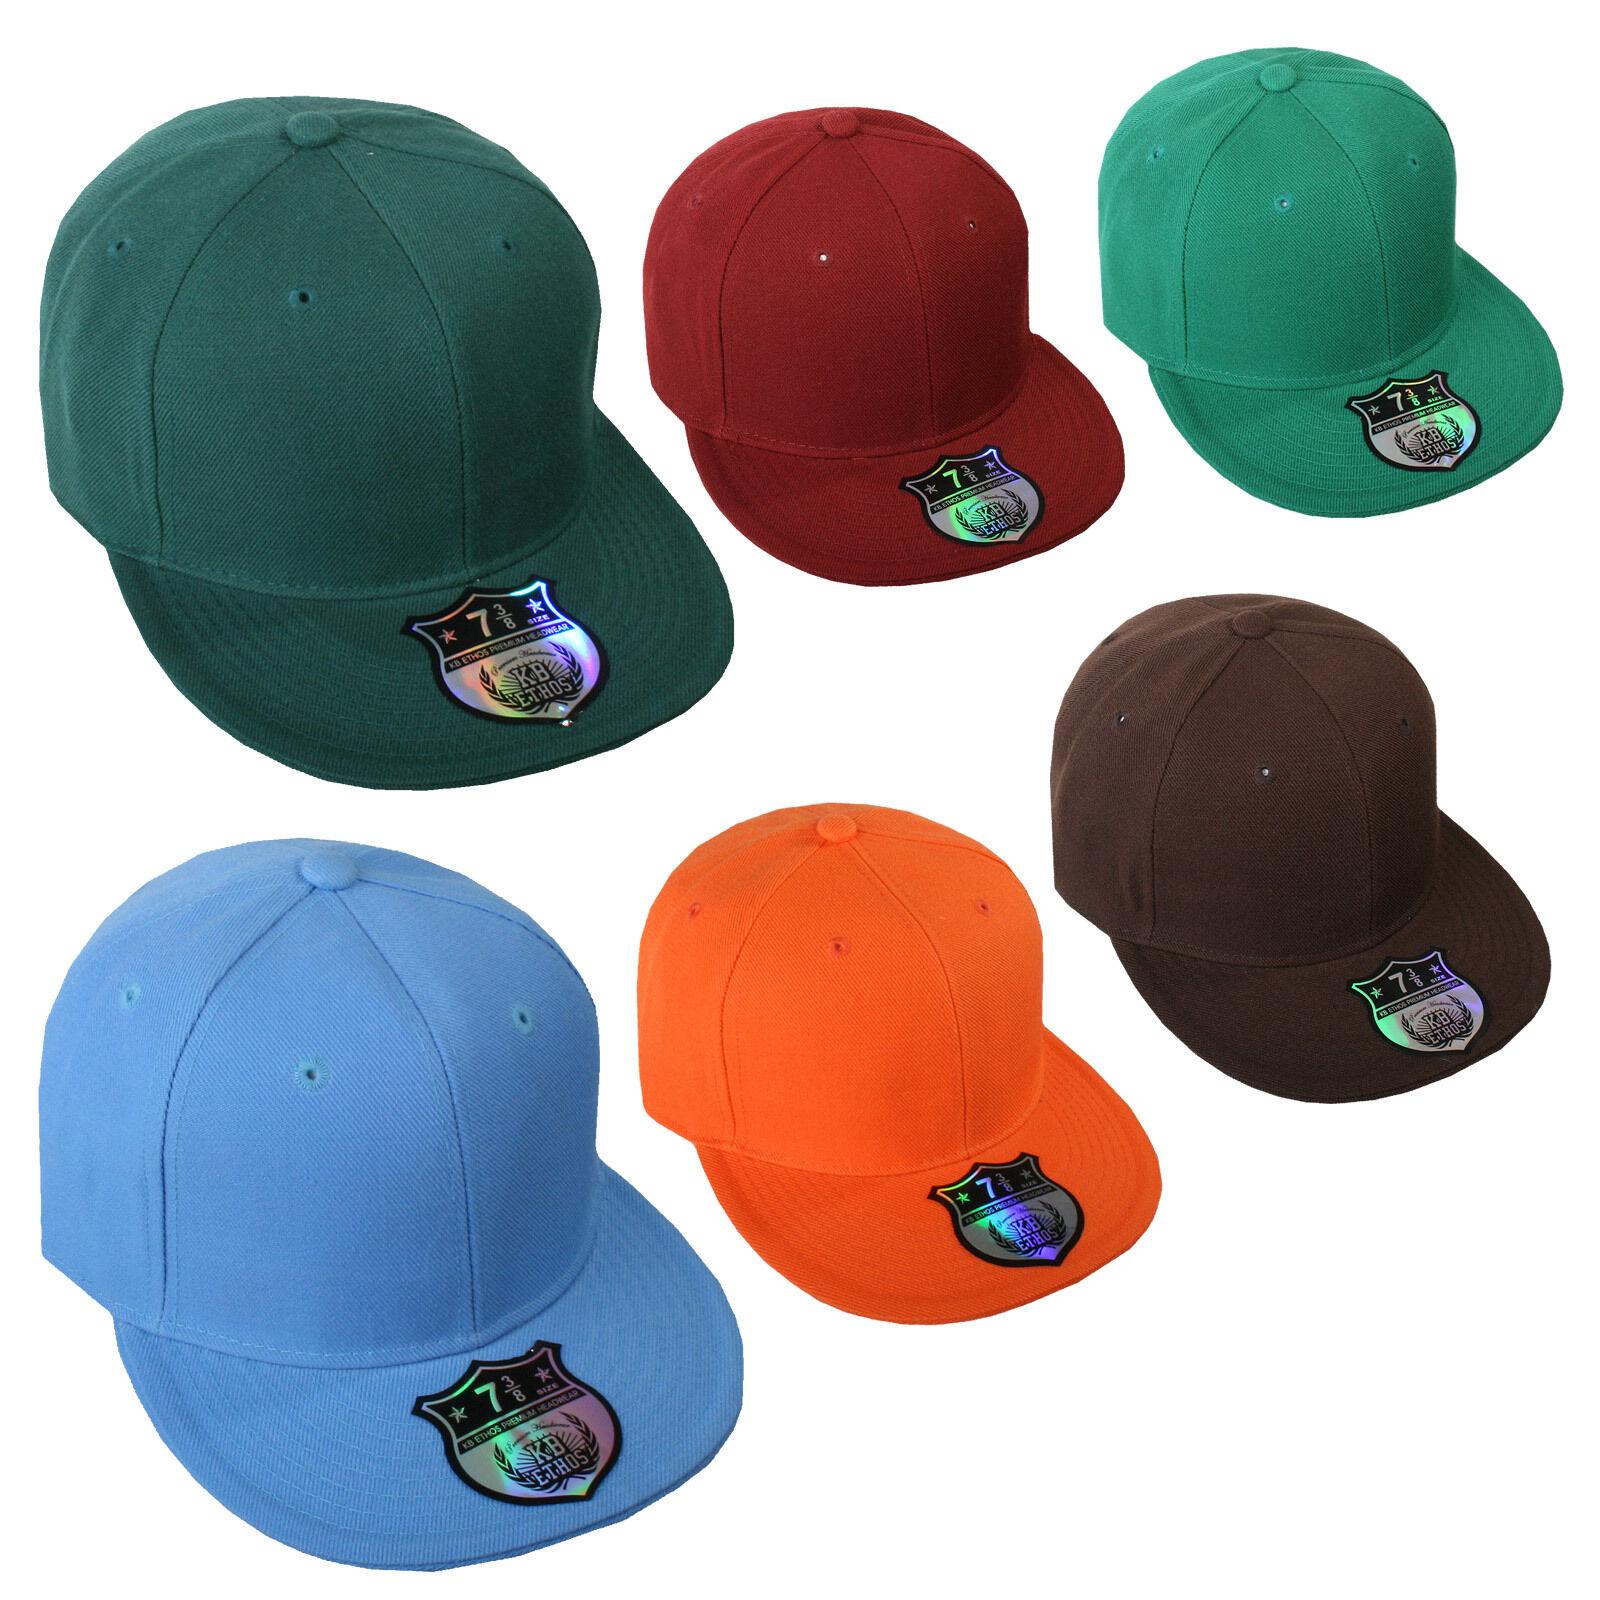 urbandreamz ltd https   stores.eBay.de urbandreamz ltd  bfa314  urbandreamz ltd 1. Our top seller CAP. ETHOS New York City ... c38e35bacee